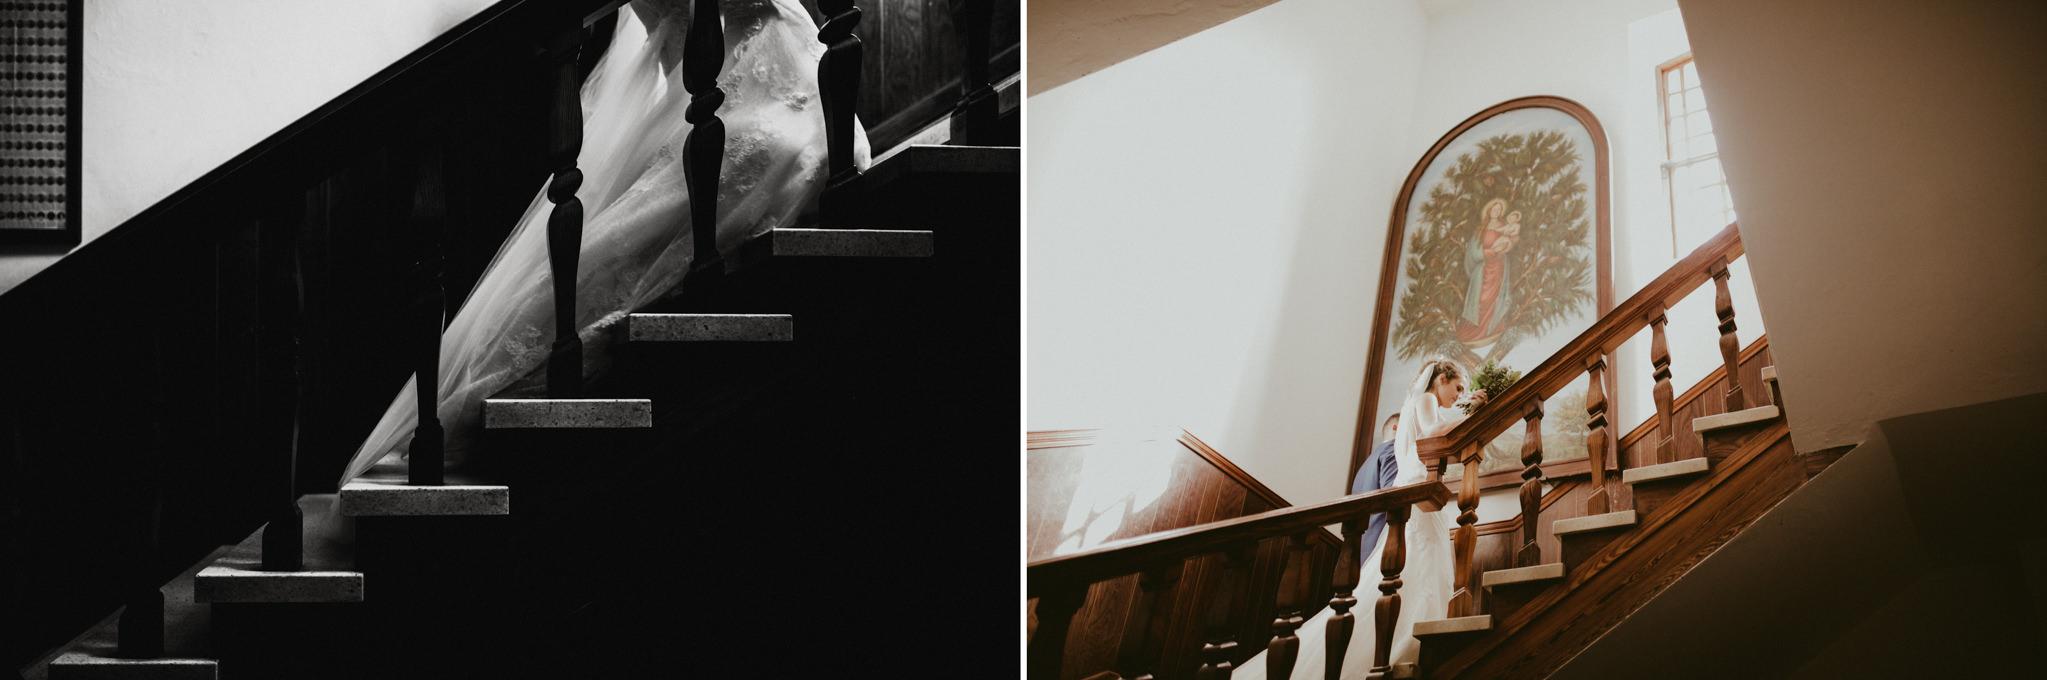 boda-diferente-fotografo-boda-laspalmas-grancanaria-111